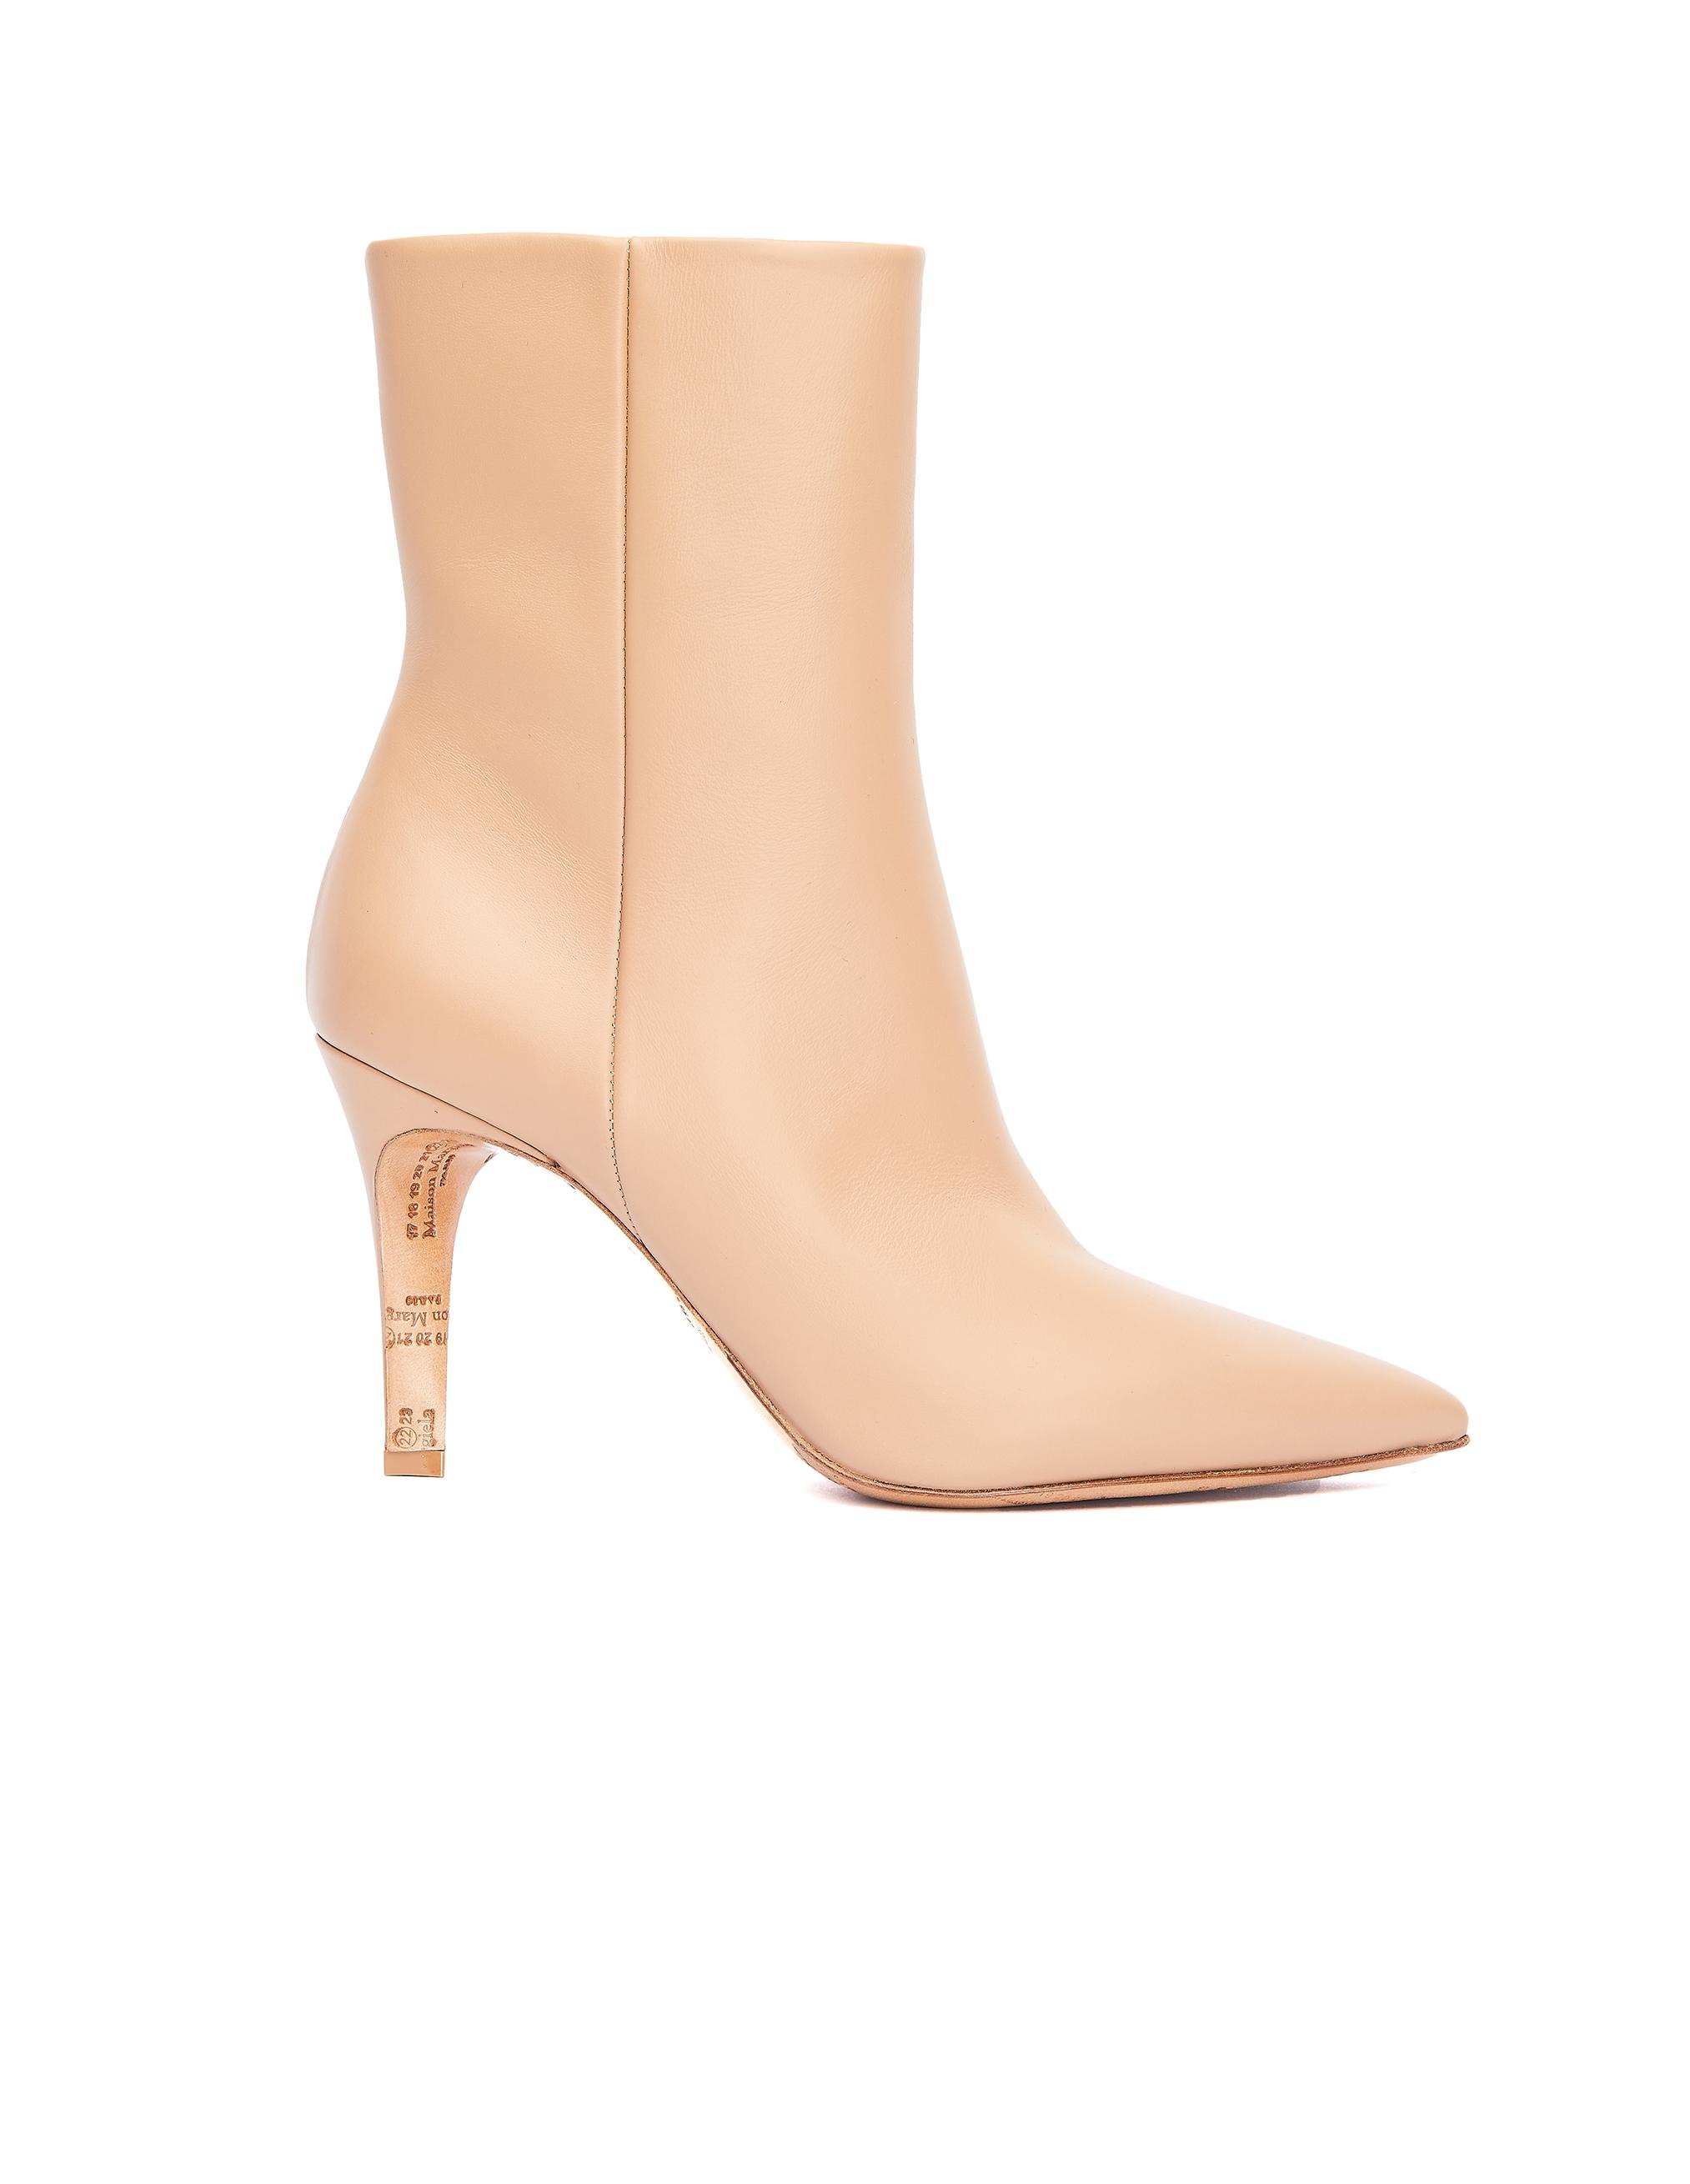 Maison Margiela Beige Leather Ankle Boots